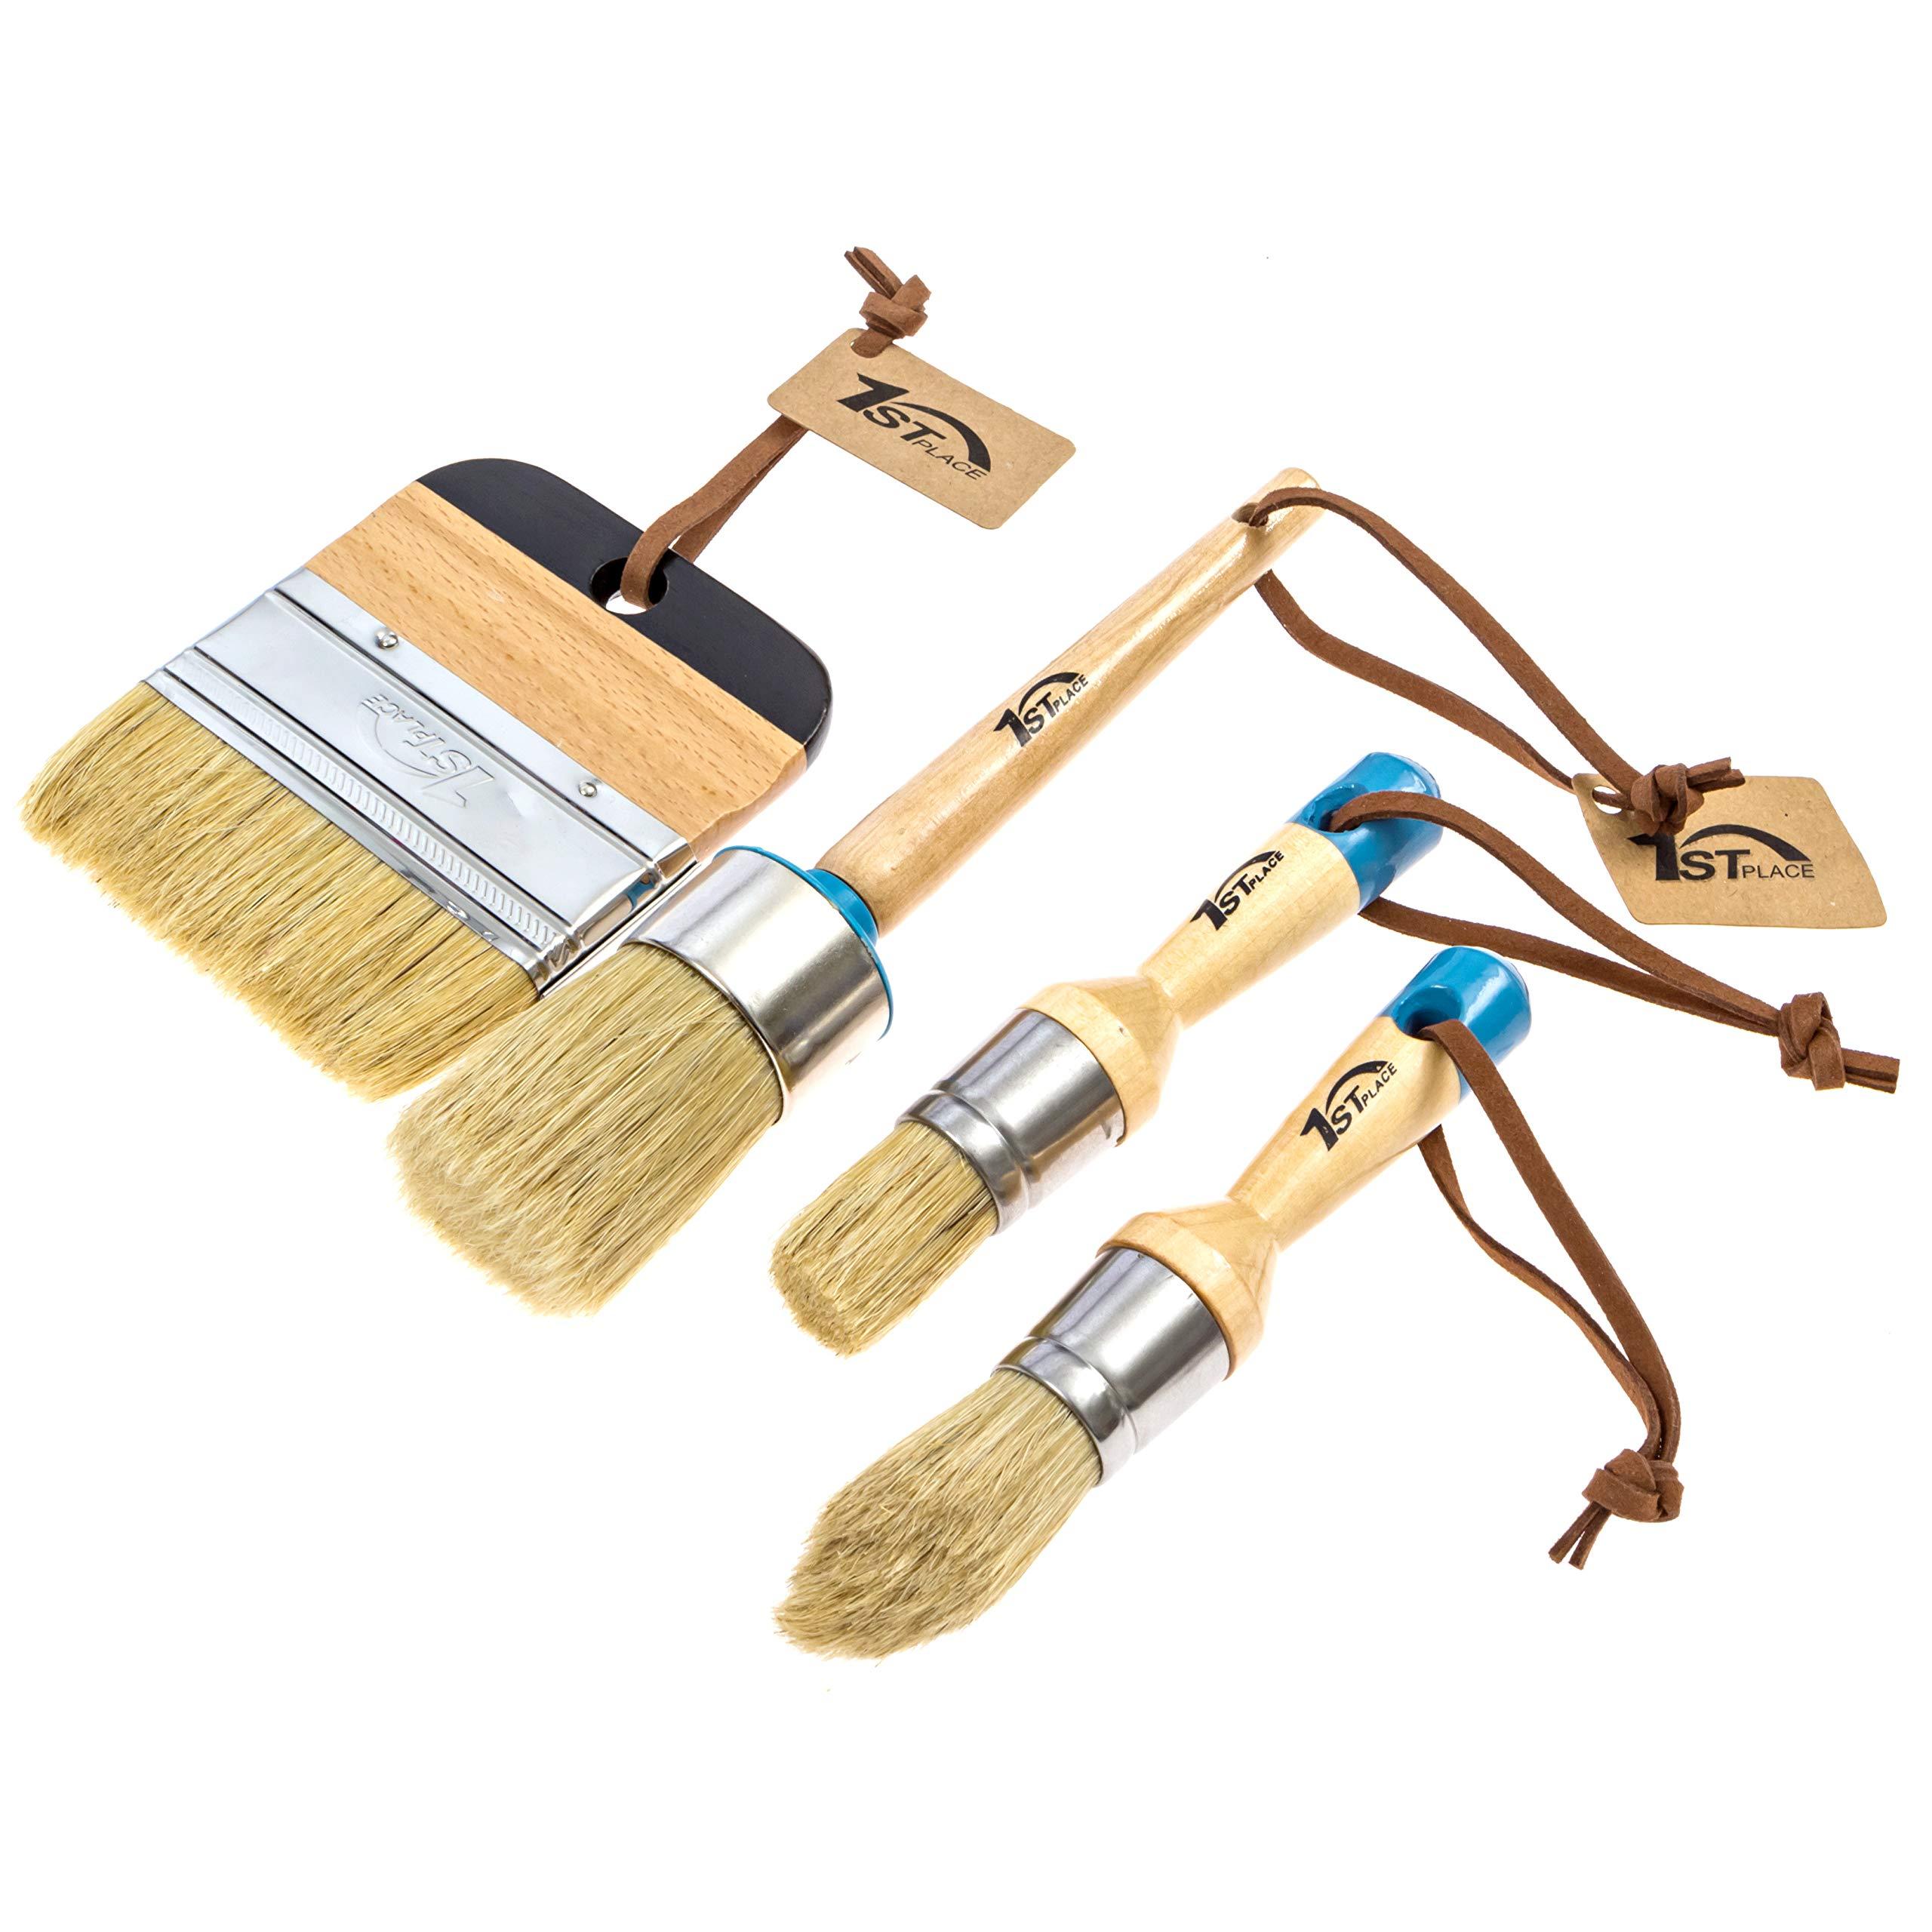 1st Place Chalk & Wax Natural Bristle Brush Set - Round Brush, 2 Piece Brush Set & 4'' Flat Brush - (4 Brushes)